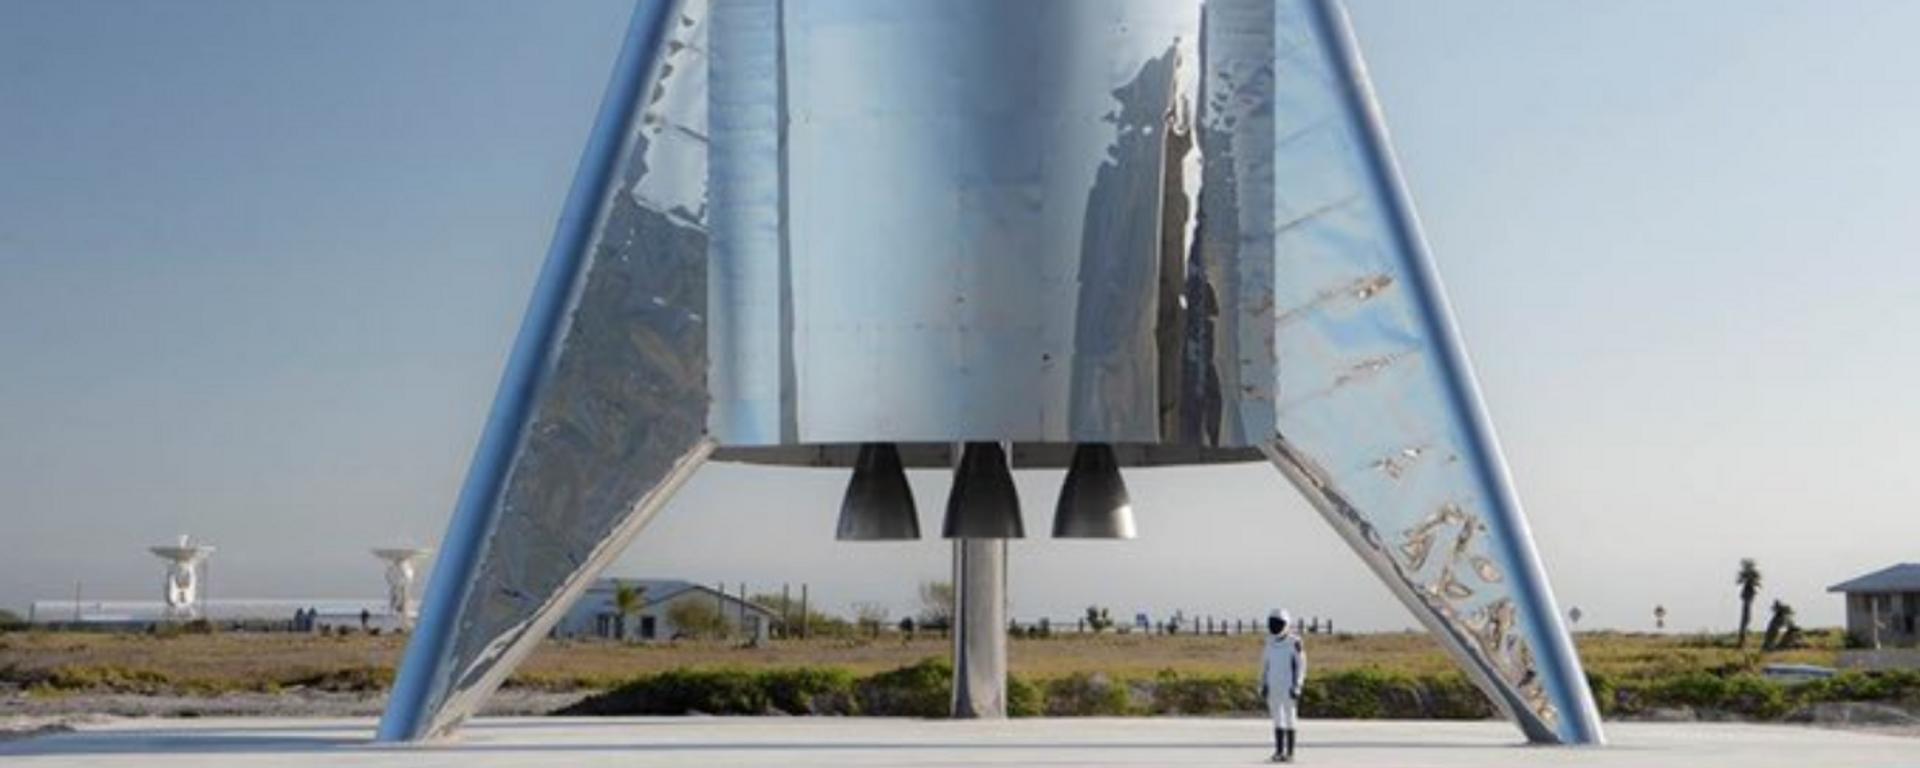 El cohete de SpaceX Starship - Sputnik Mundo, 1920, 29.03.2021